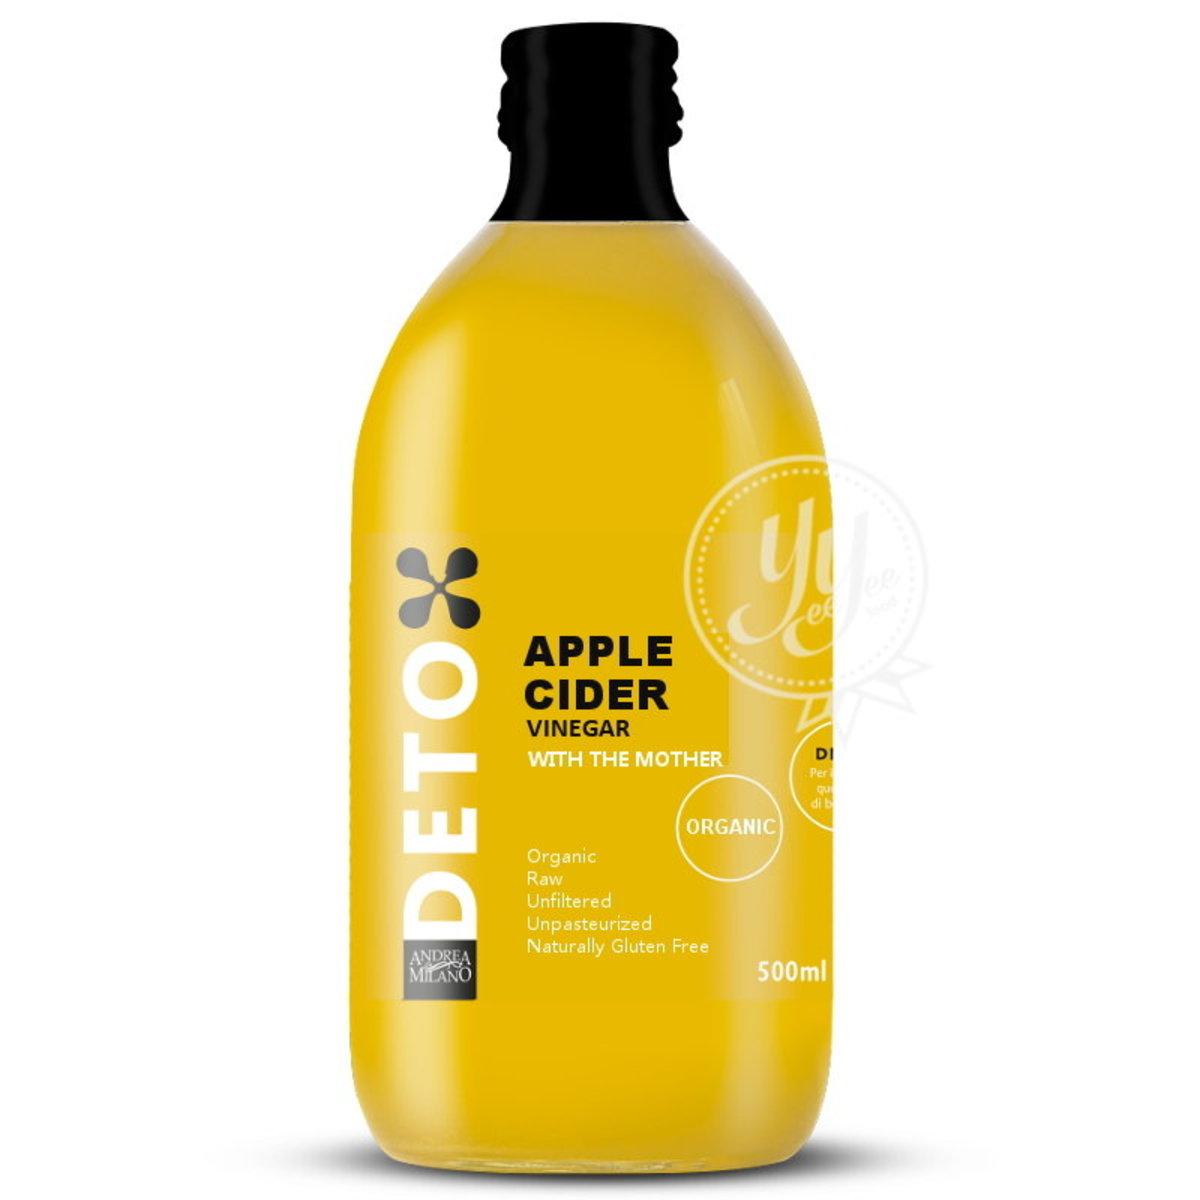 Italian Organic Apple Cider Vinegar With The Mother 500ml